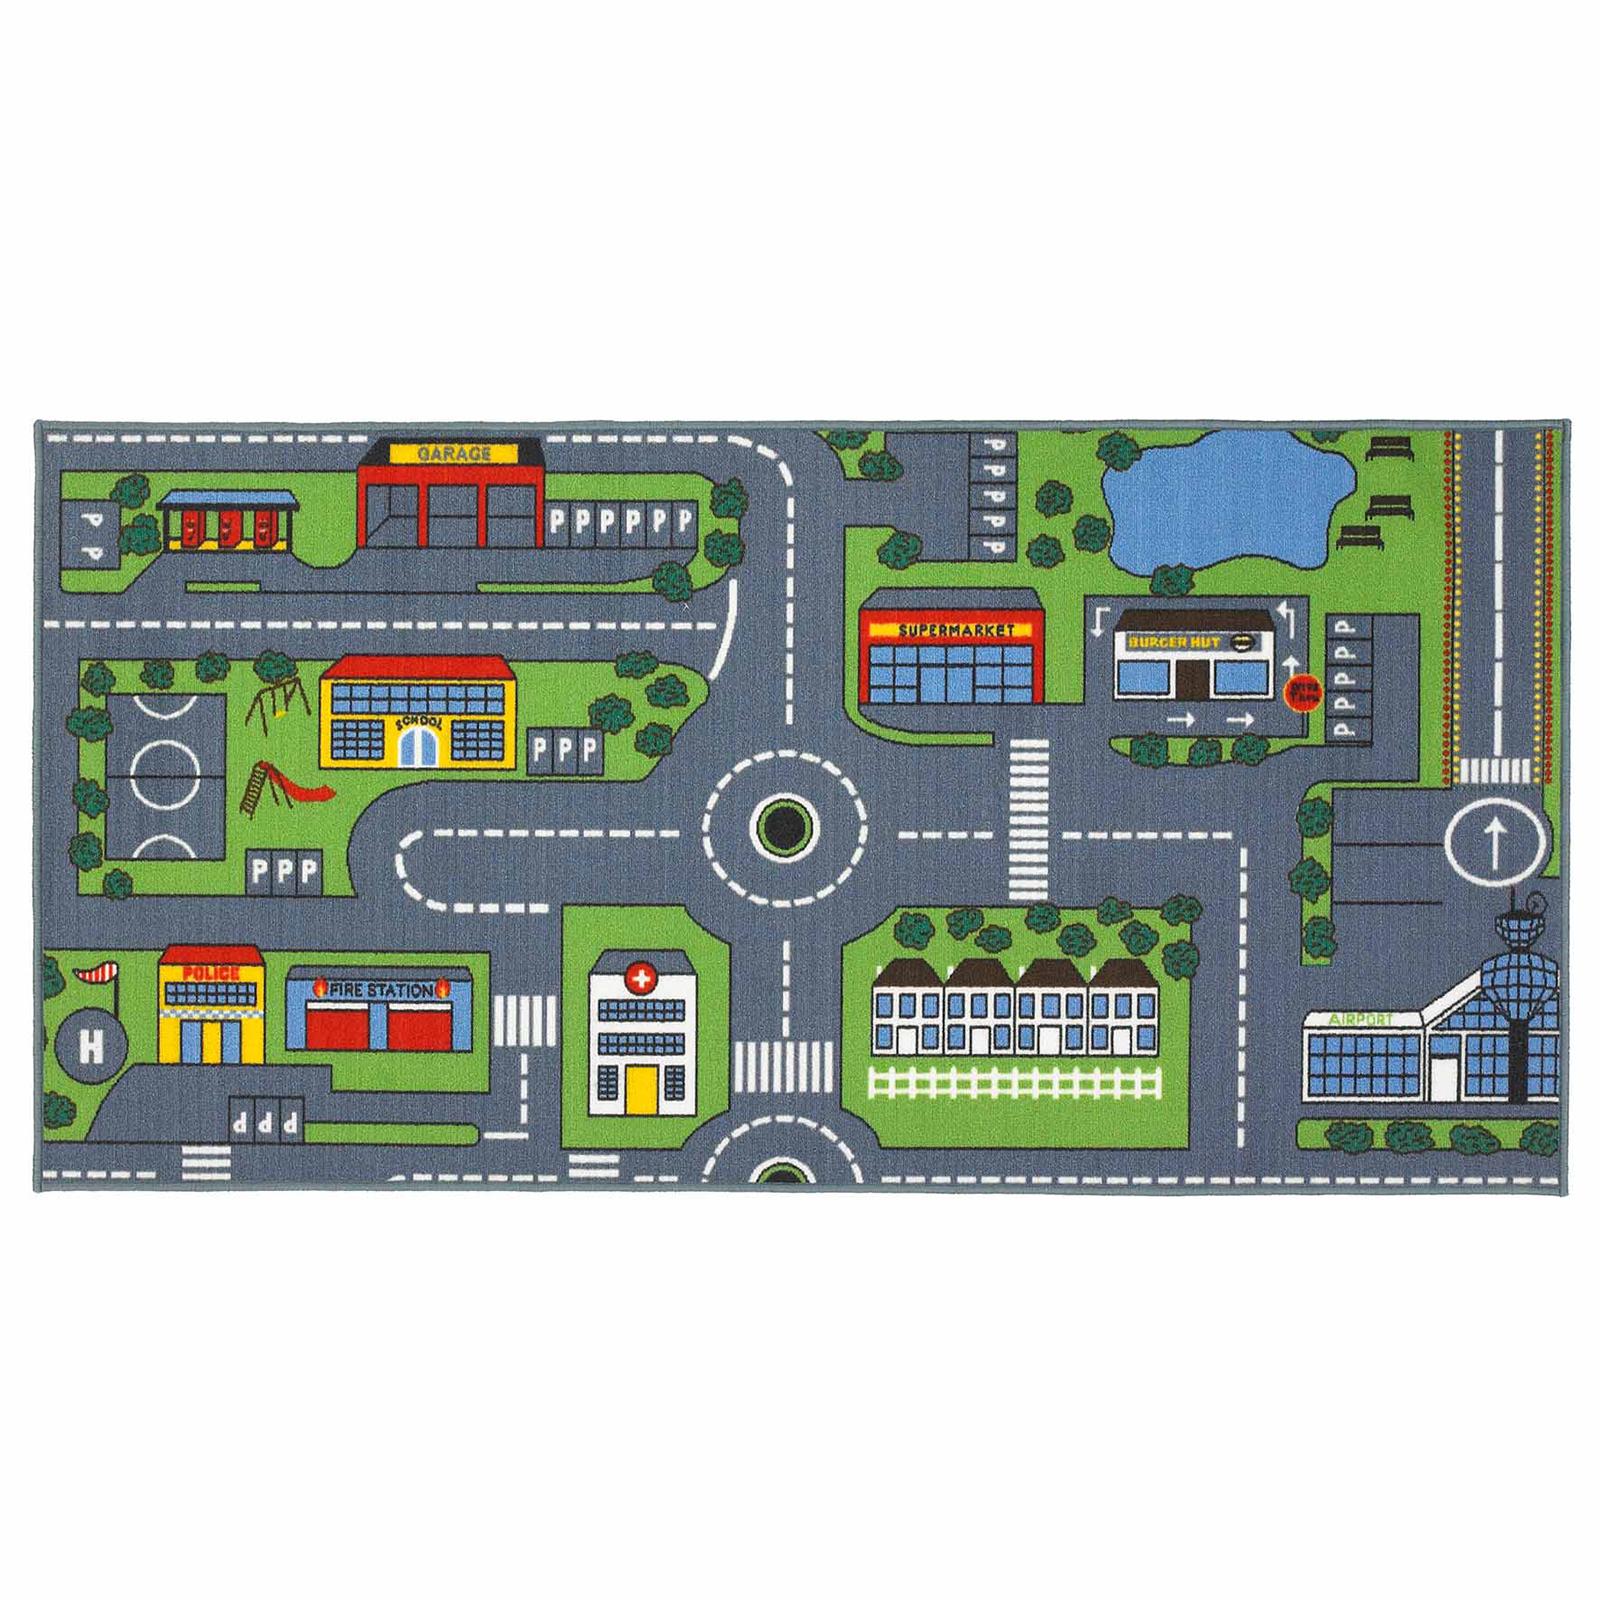 Playtime-Large-Road-Map-2.jpg